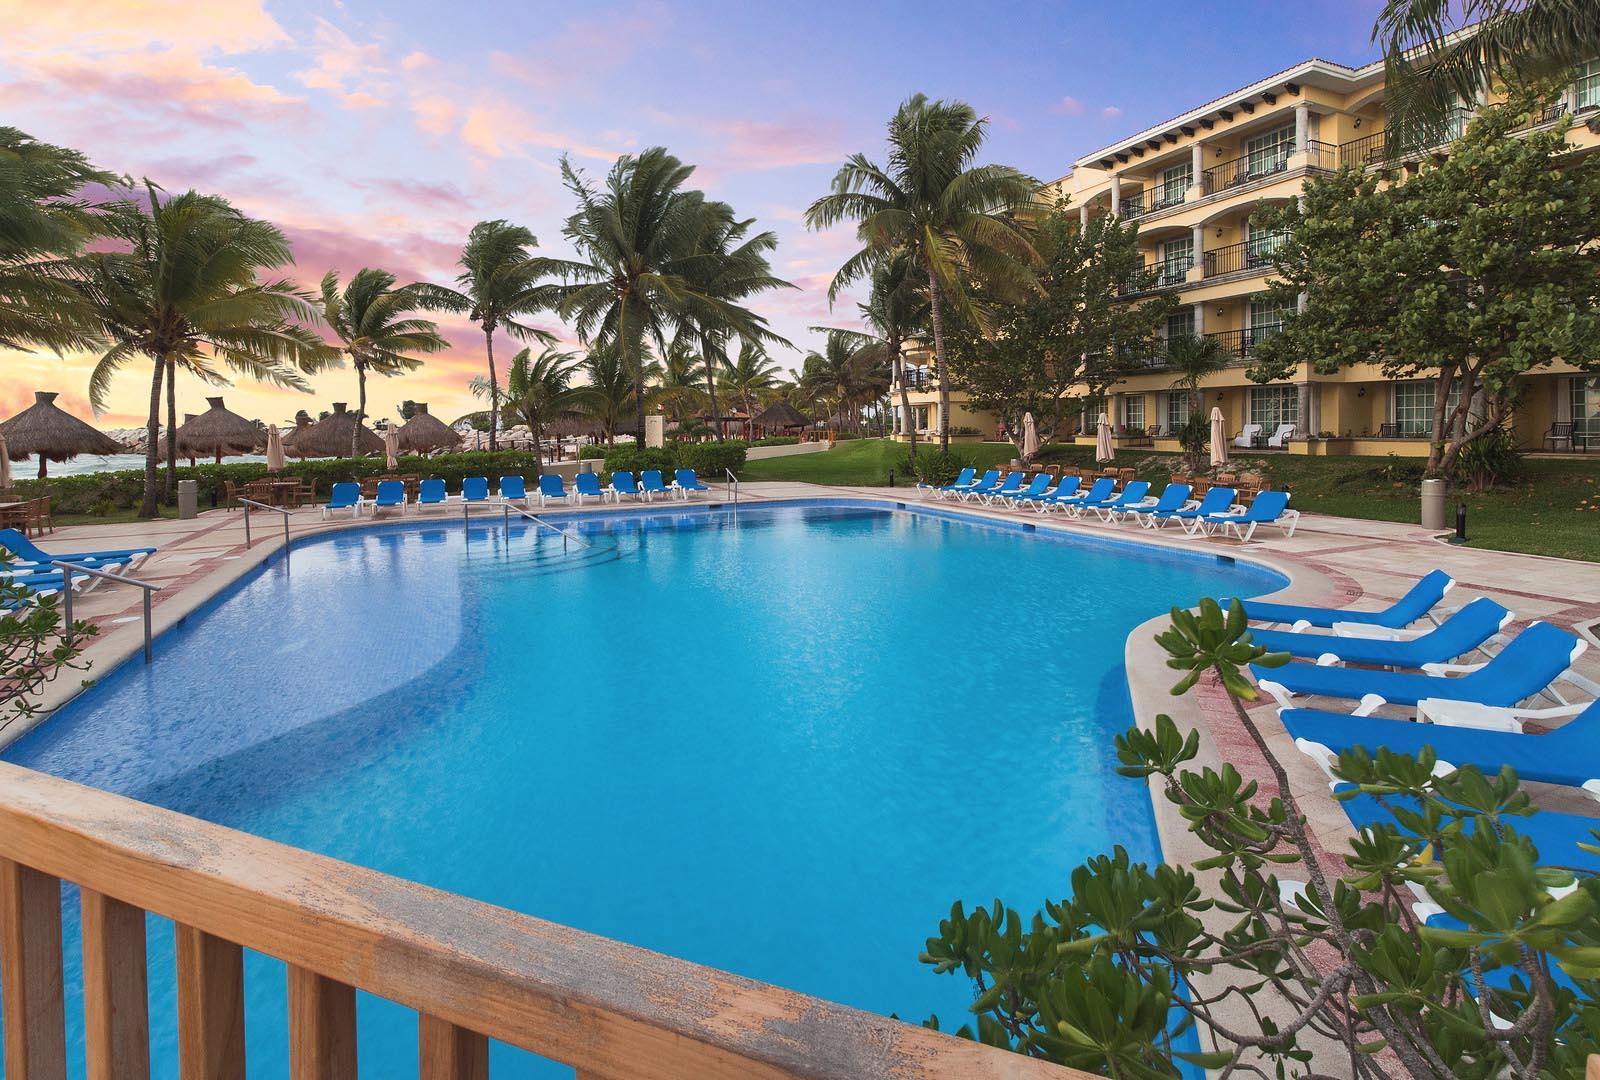 Hotel Marina El Cid swimming pool